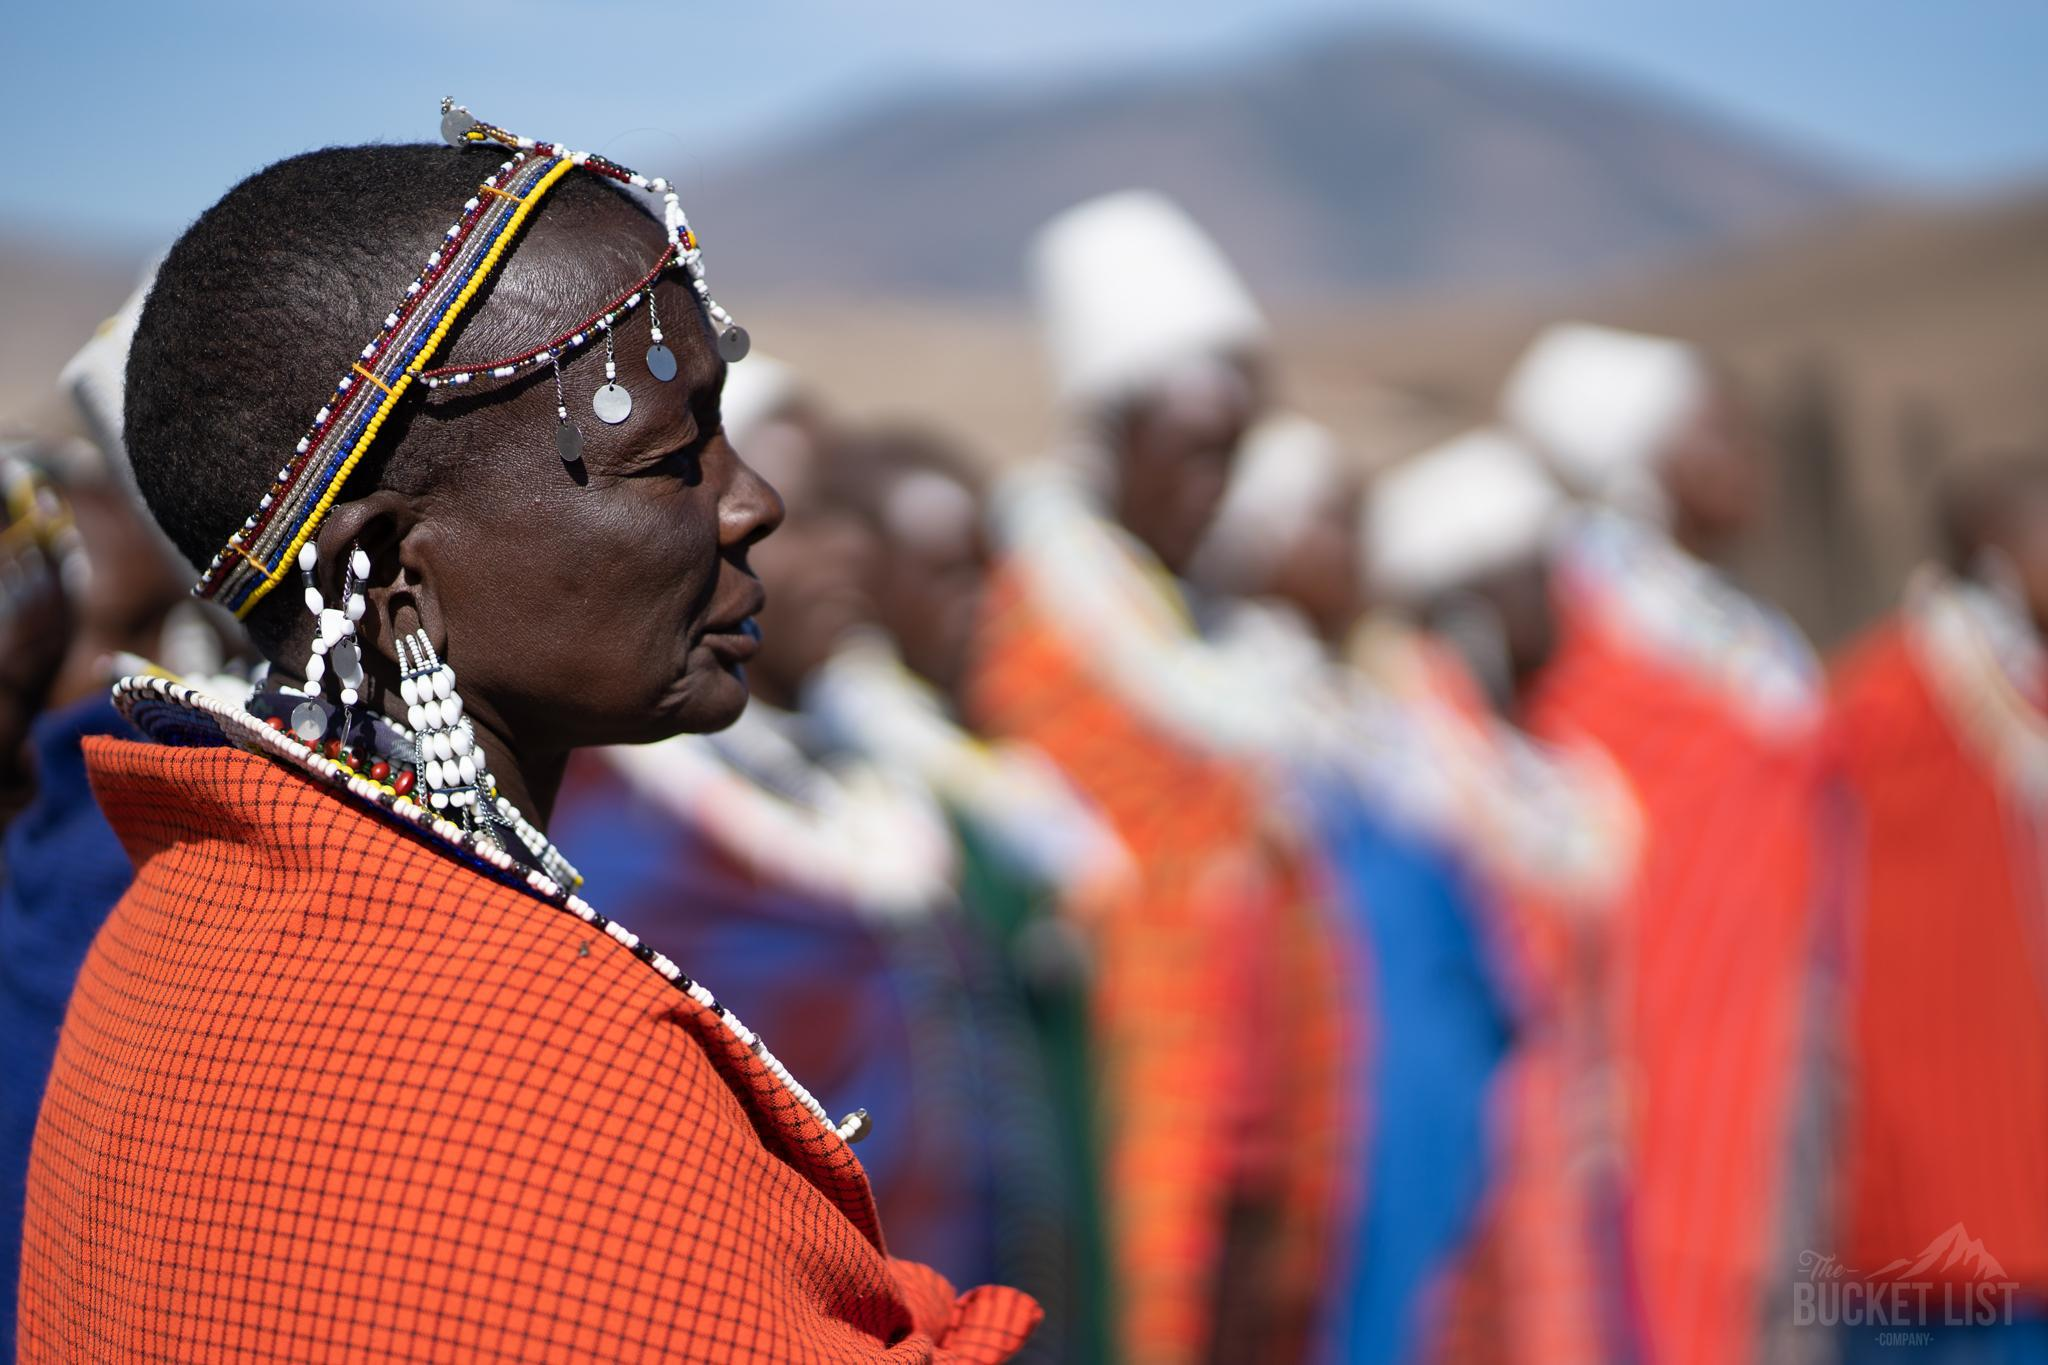 A group of people who live near Kilimanjaro